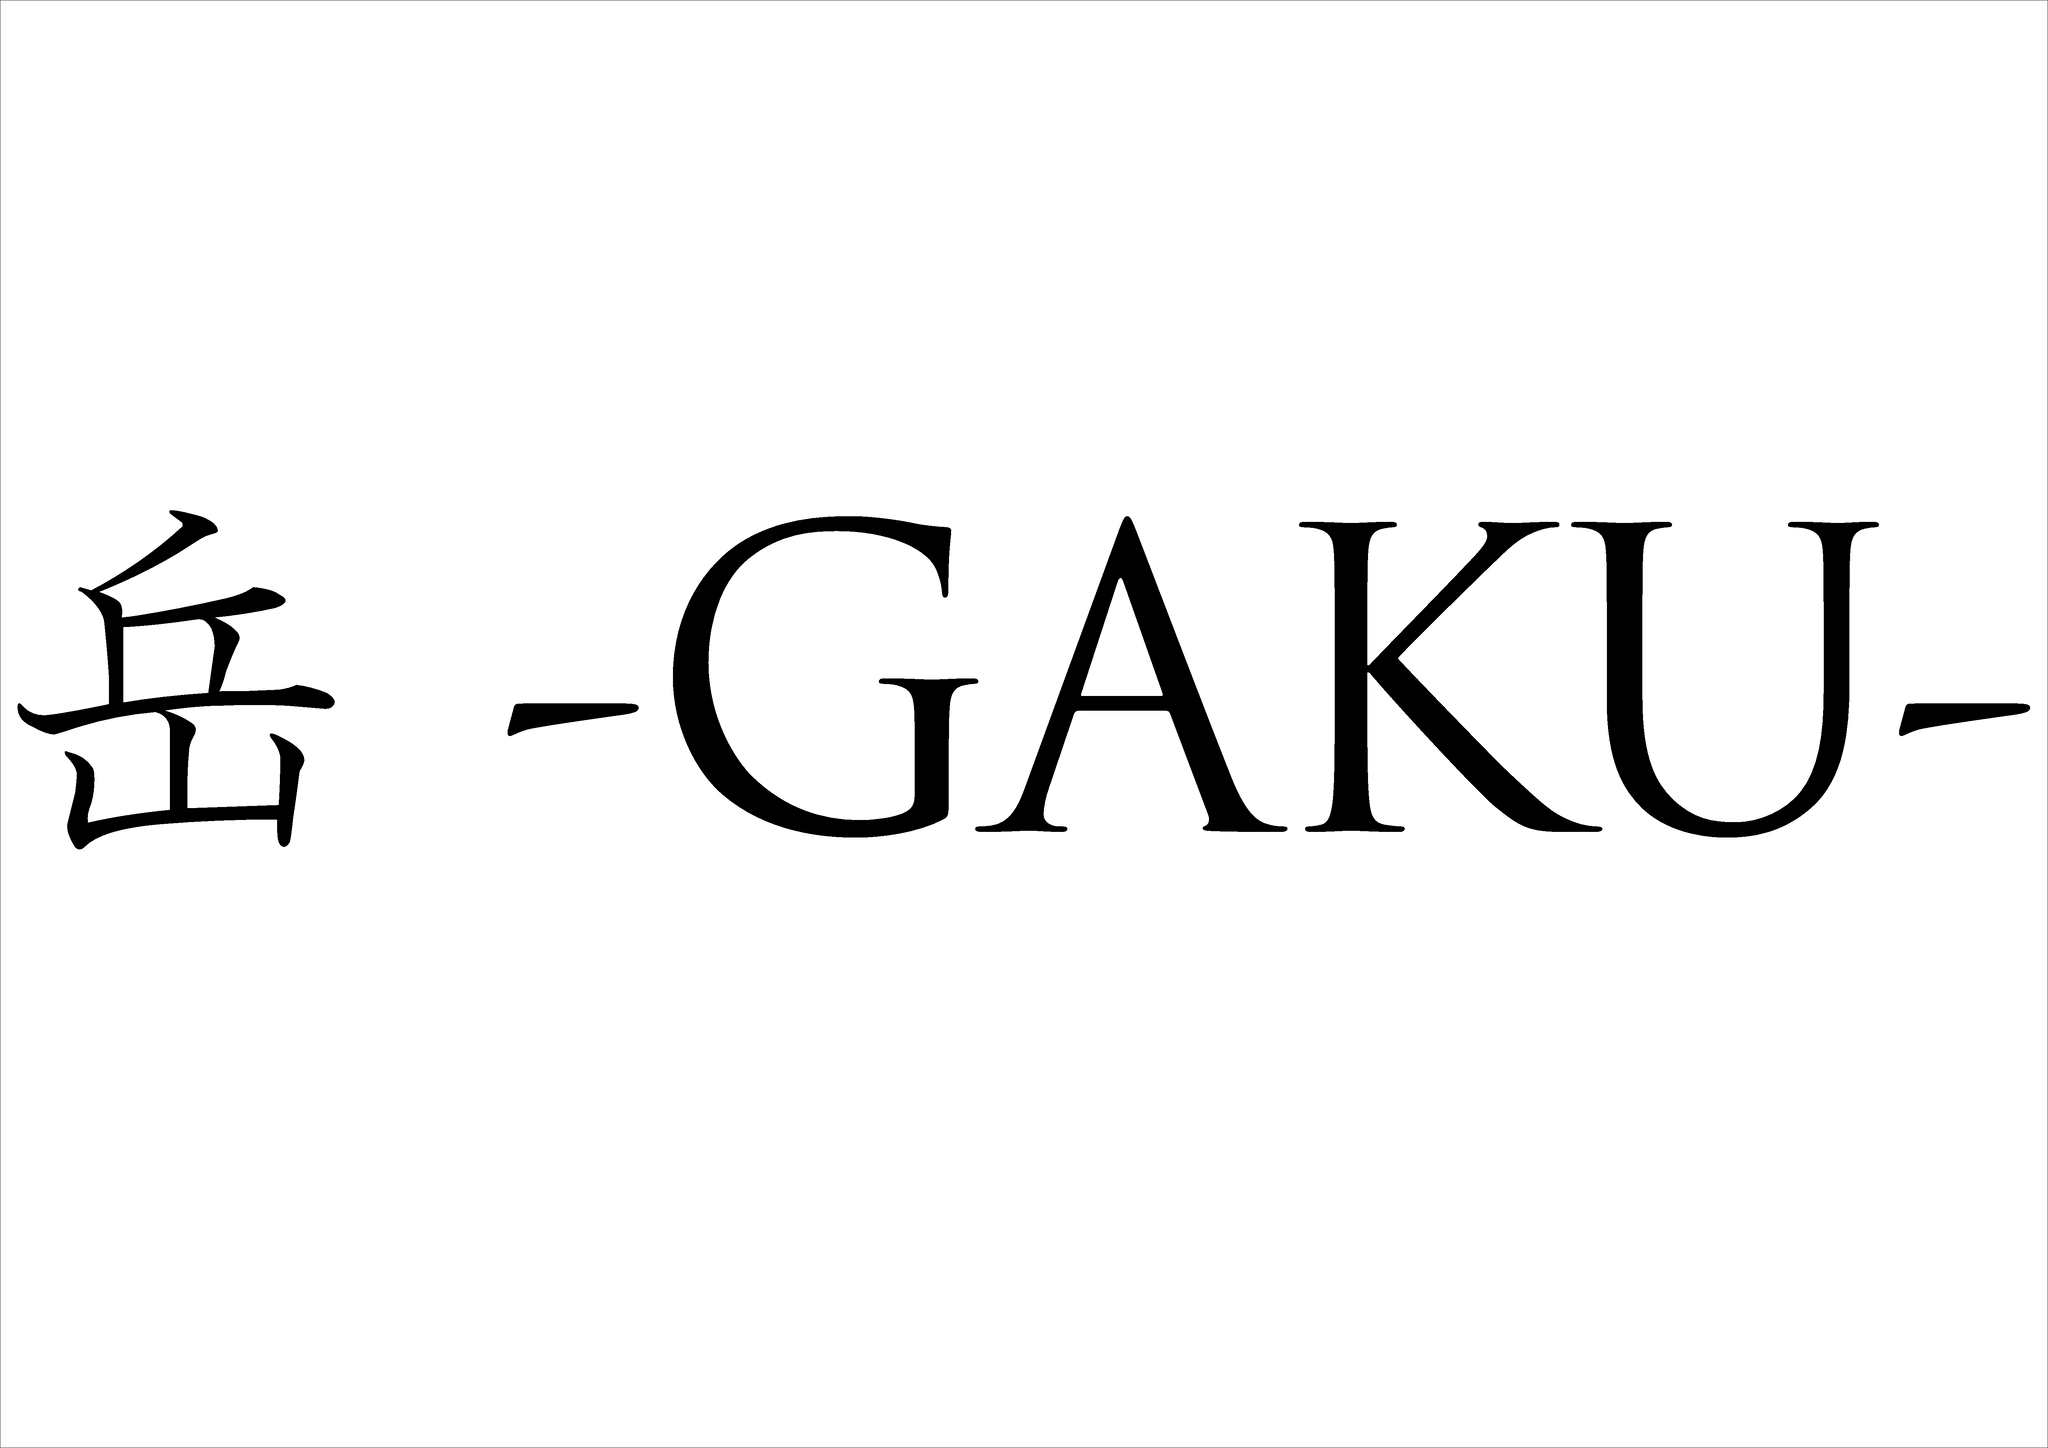 岳 -gaku-